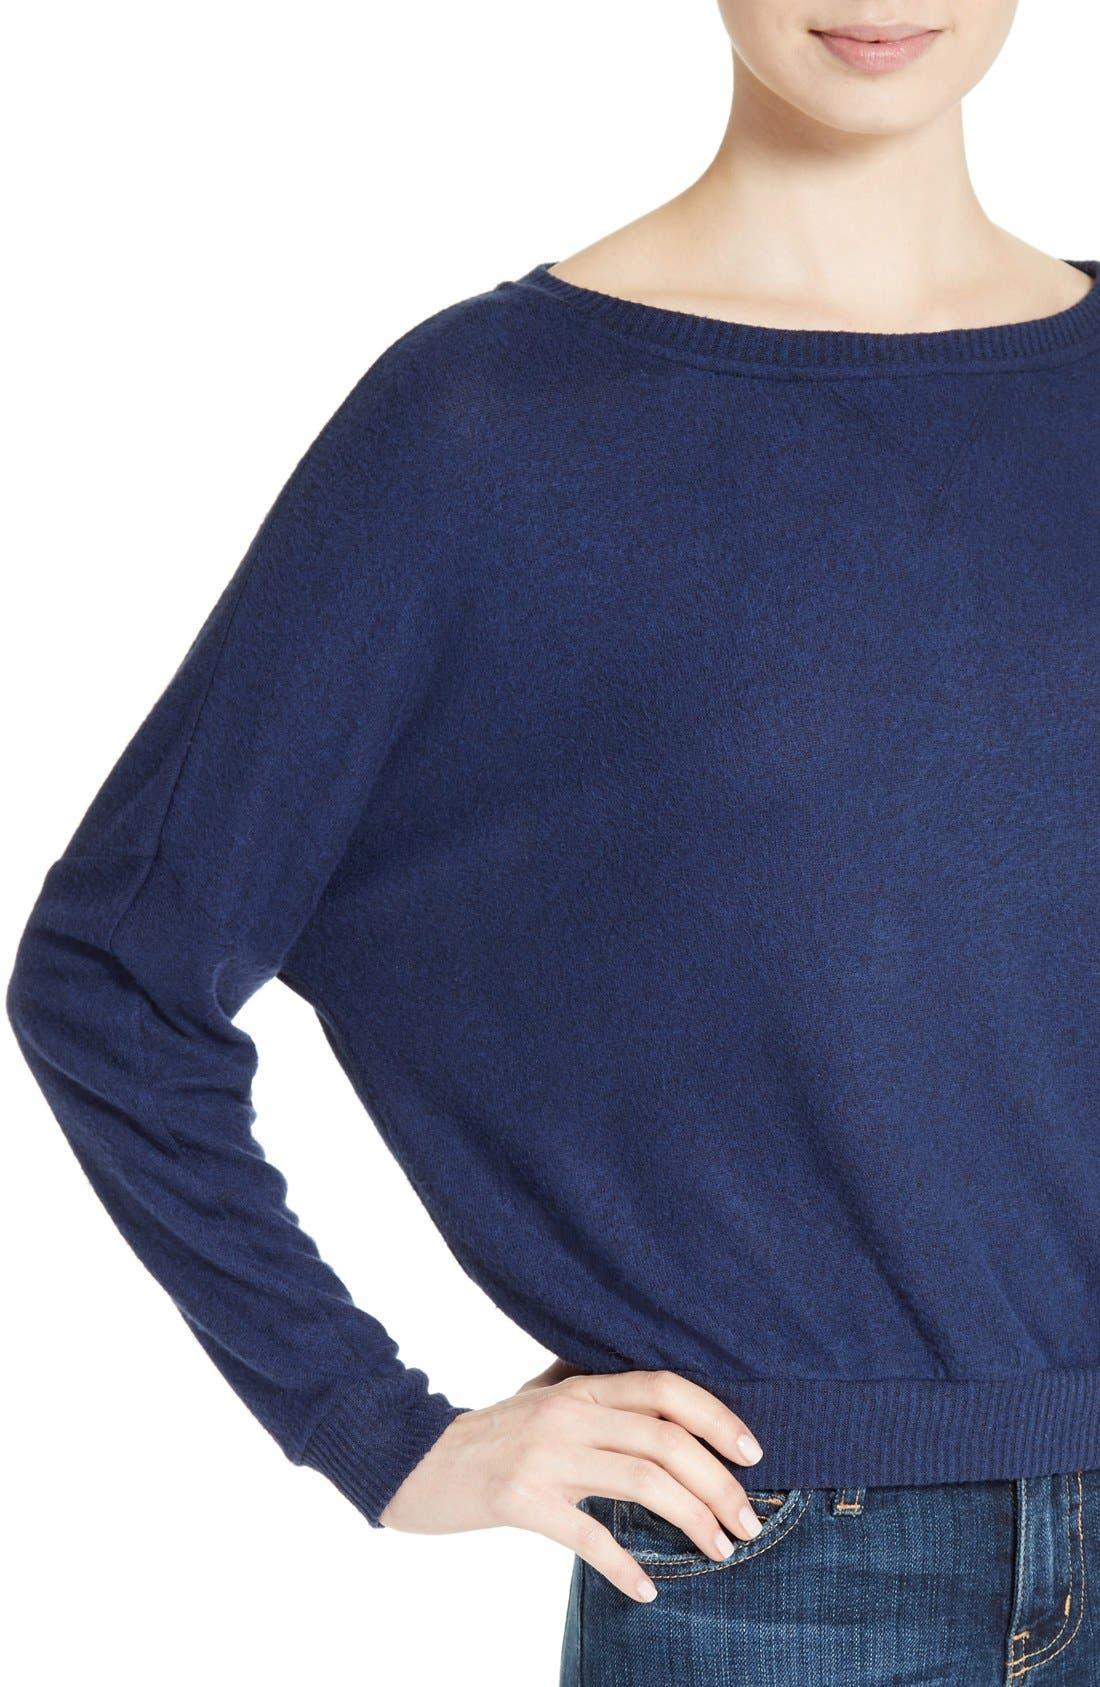 Soft Joie Giardia Drop Shoulder Sweater,                             Alternate thumbnail 4, color,                             Peacoat